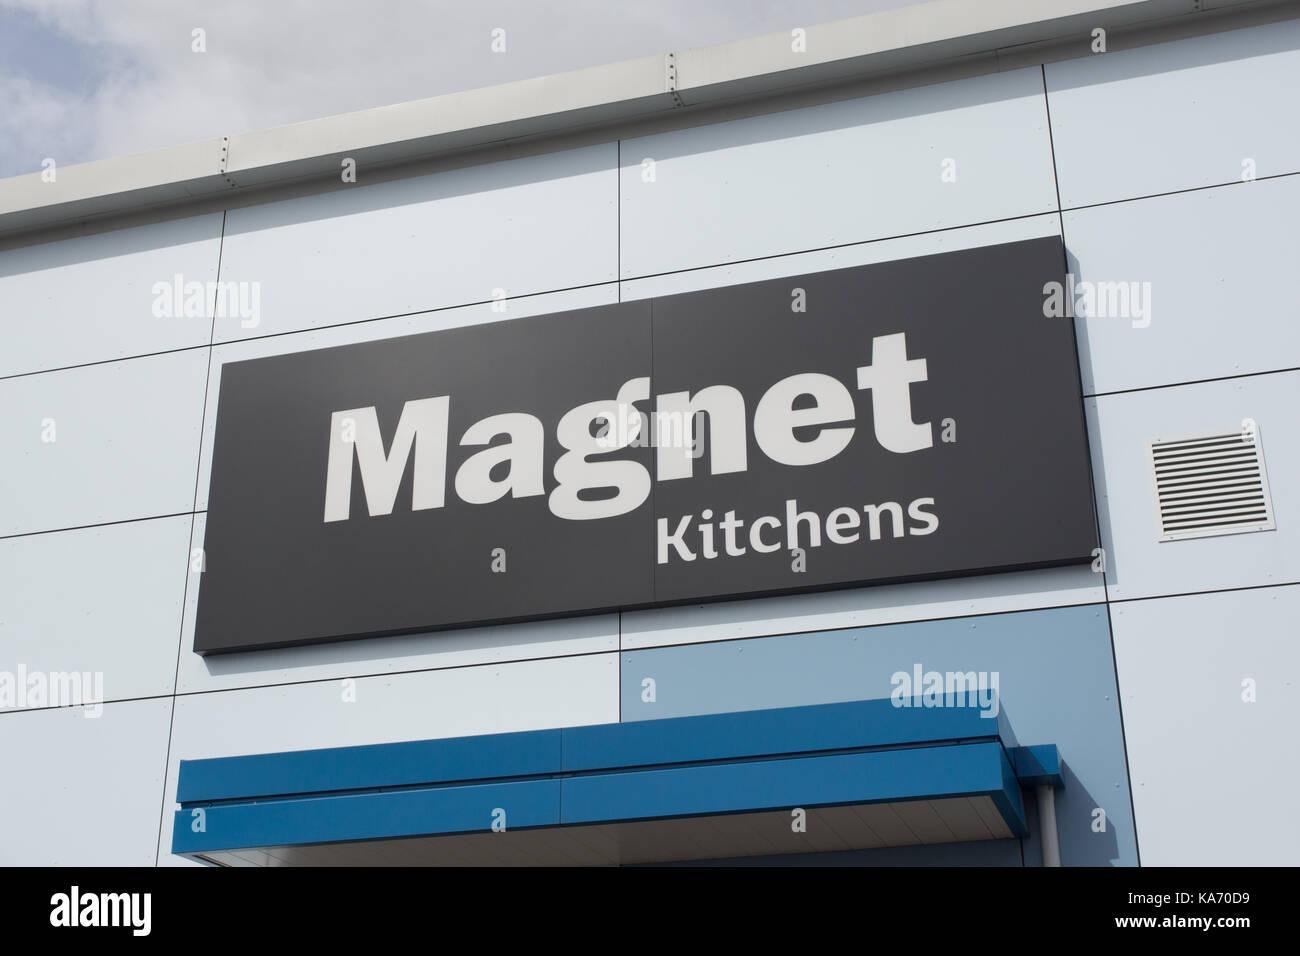 Magnet Kitchens store signage - Stock Image